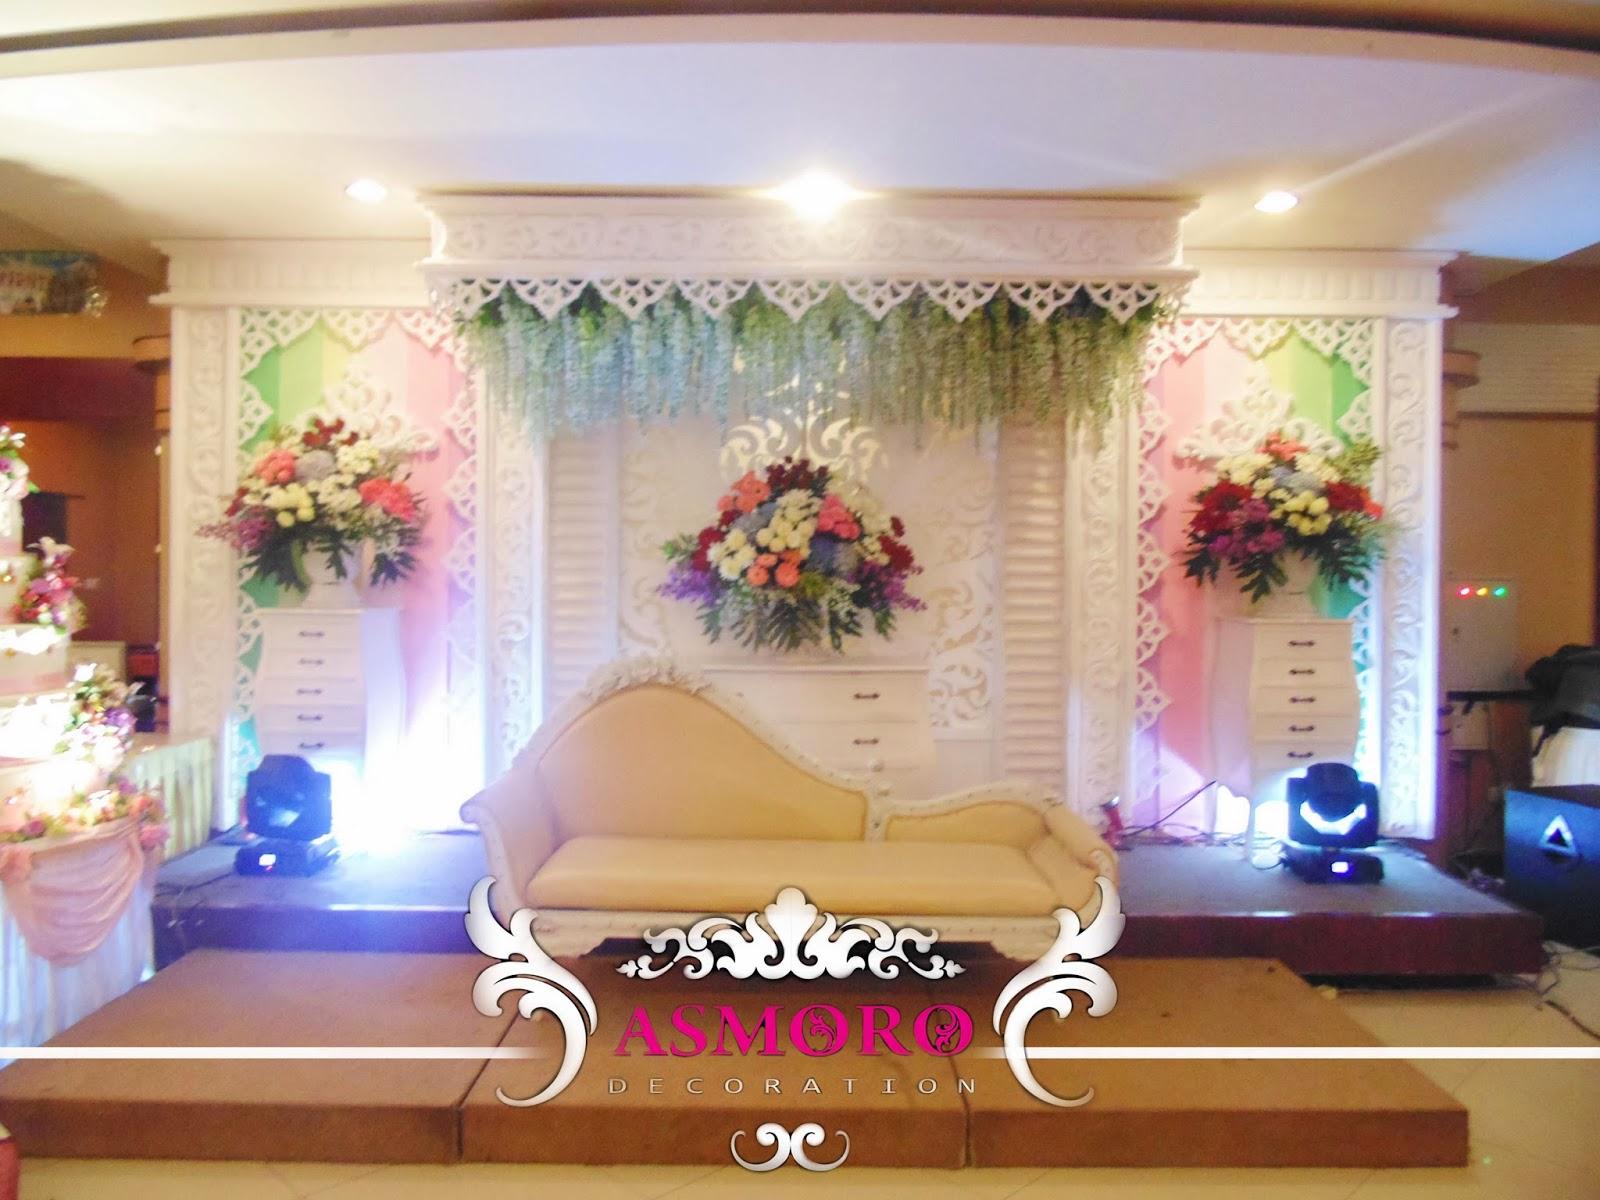 Dekorasi solo asmoro decoration november 2013 for Asmoro decoration